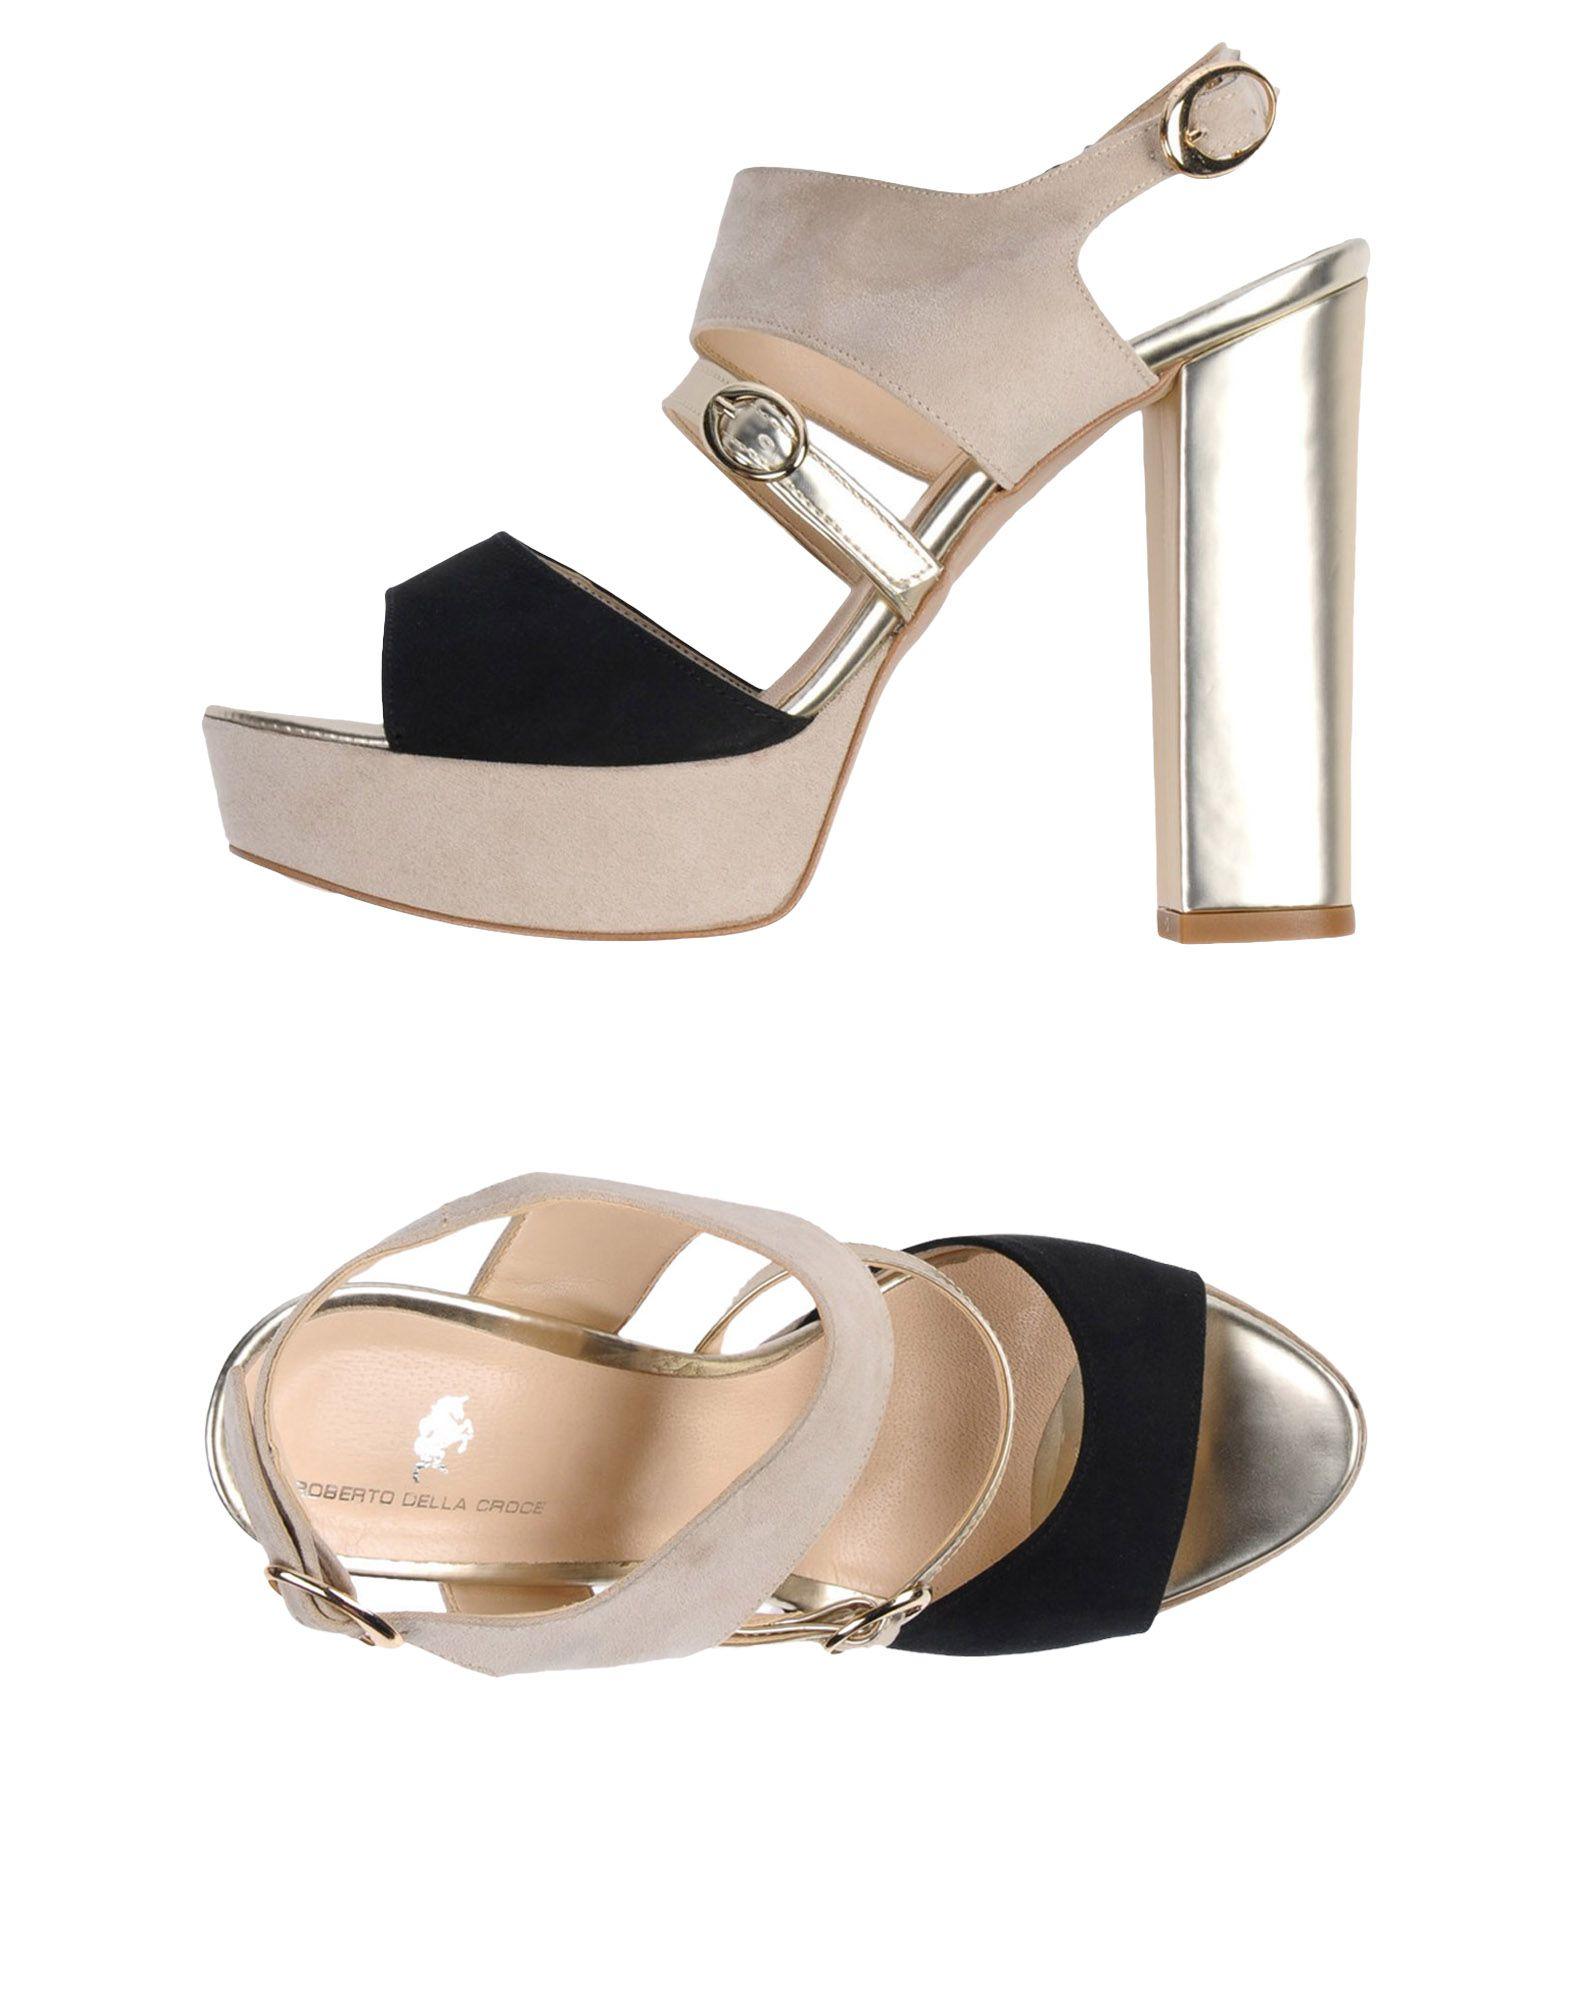 Roberto Della Croce Sandalen Damen  Gute 11411364AL Gute  Qualität beliebte Schuhe 10a13a